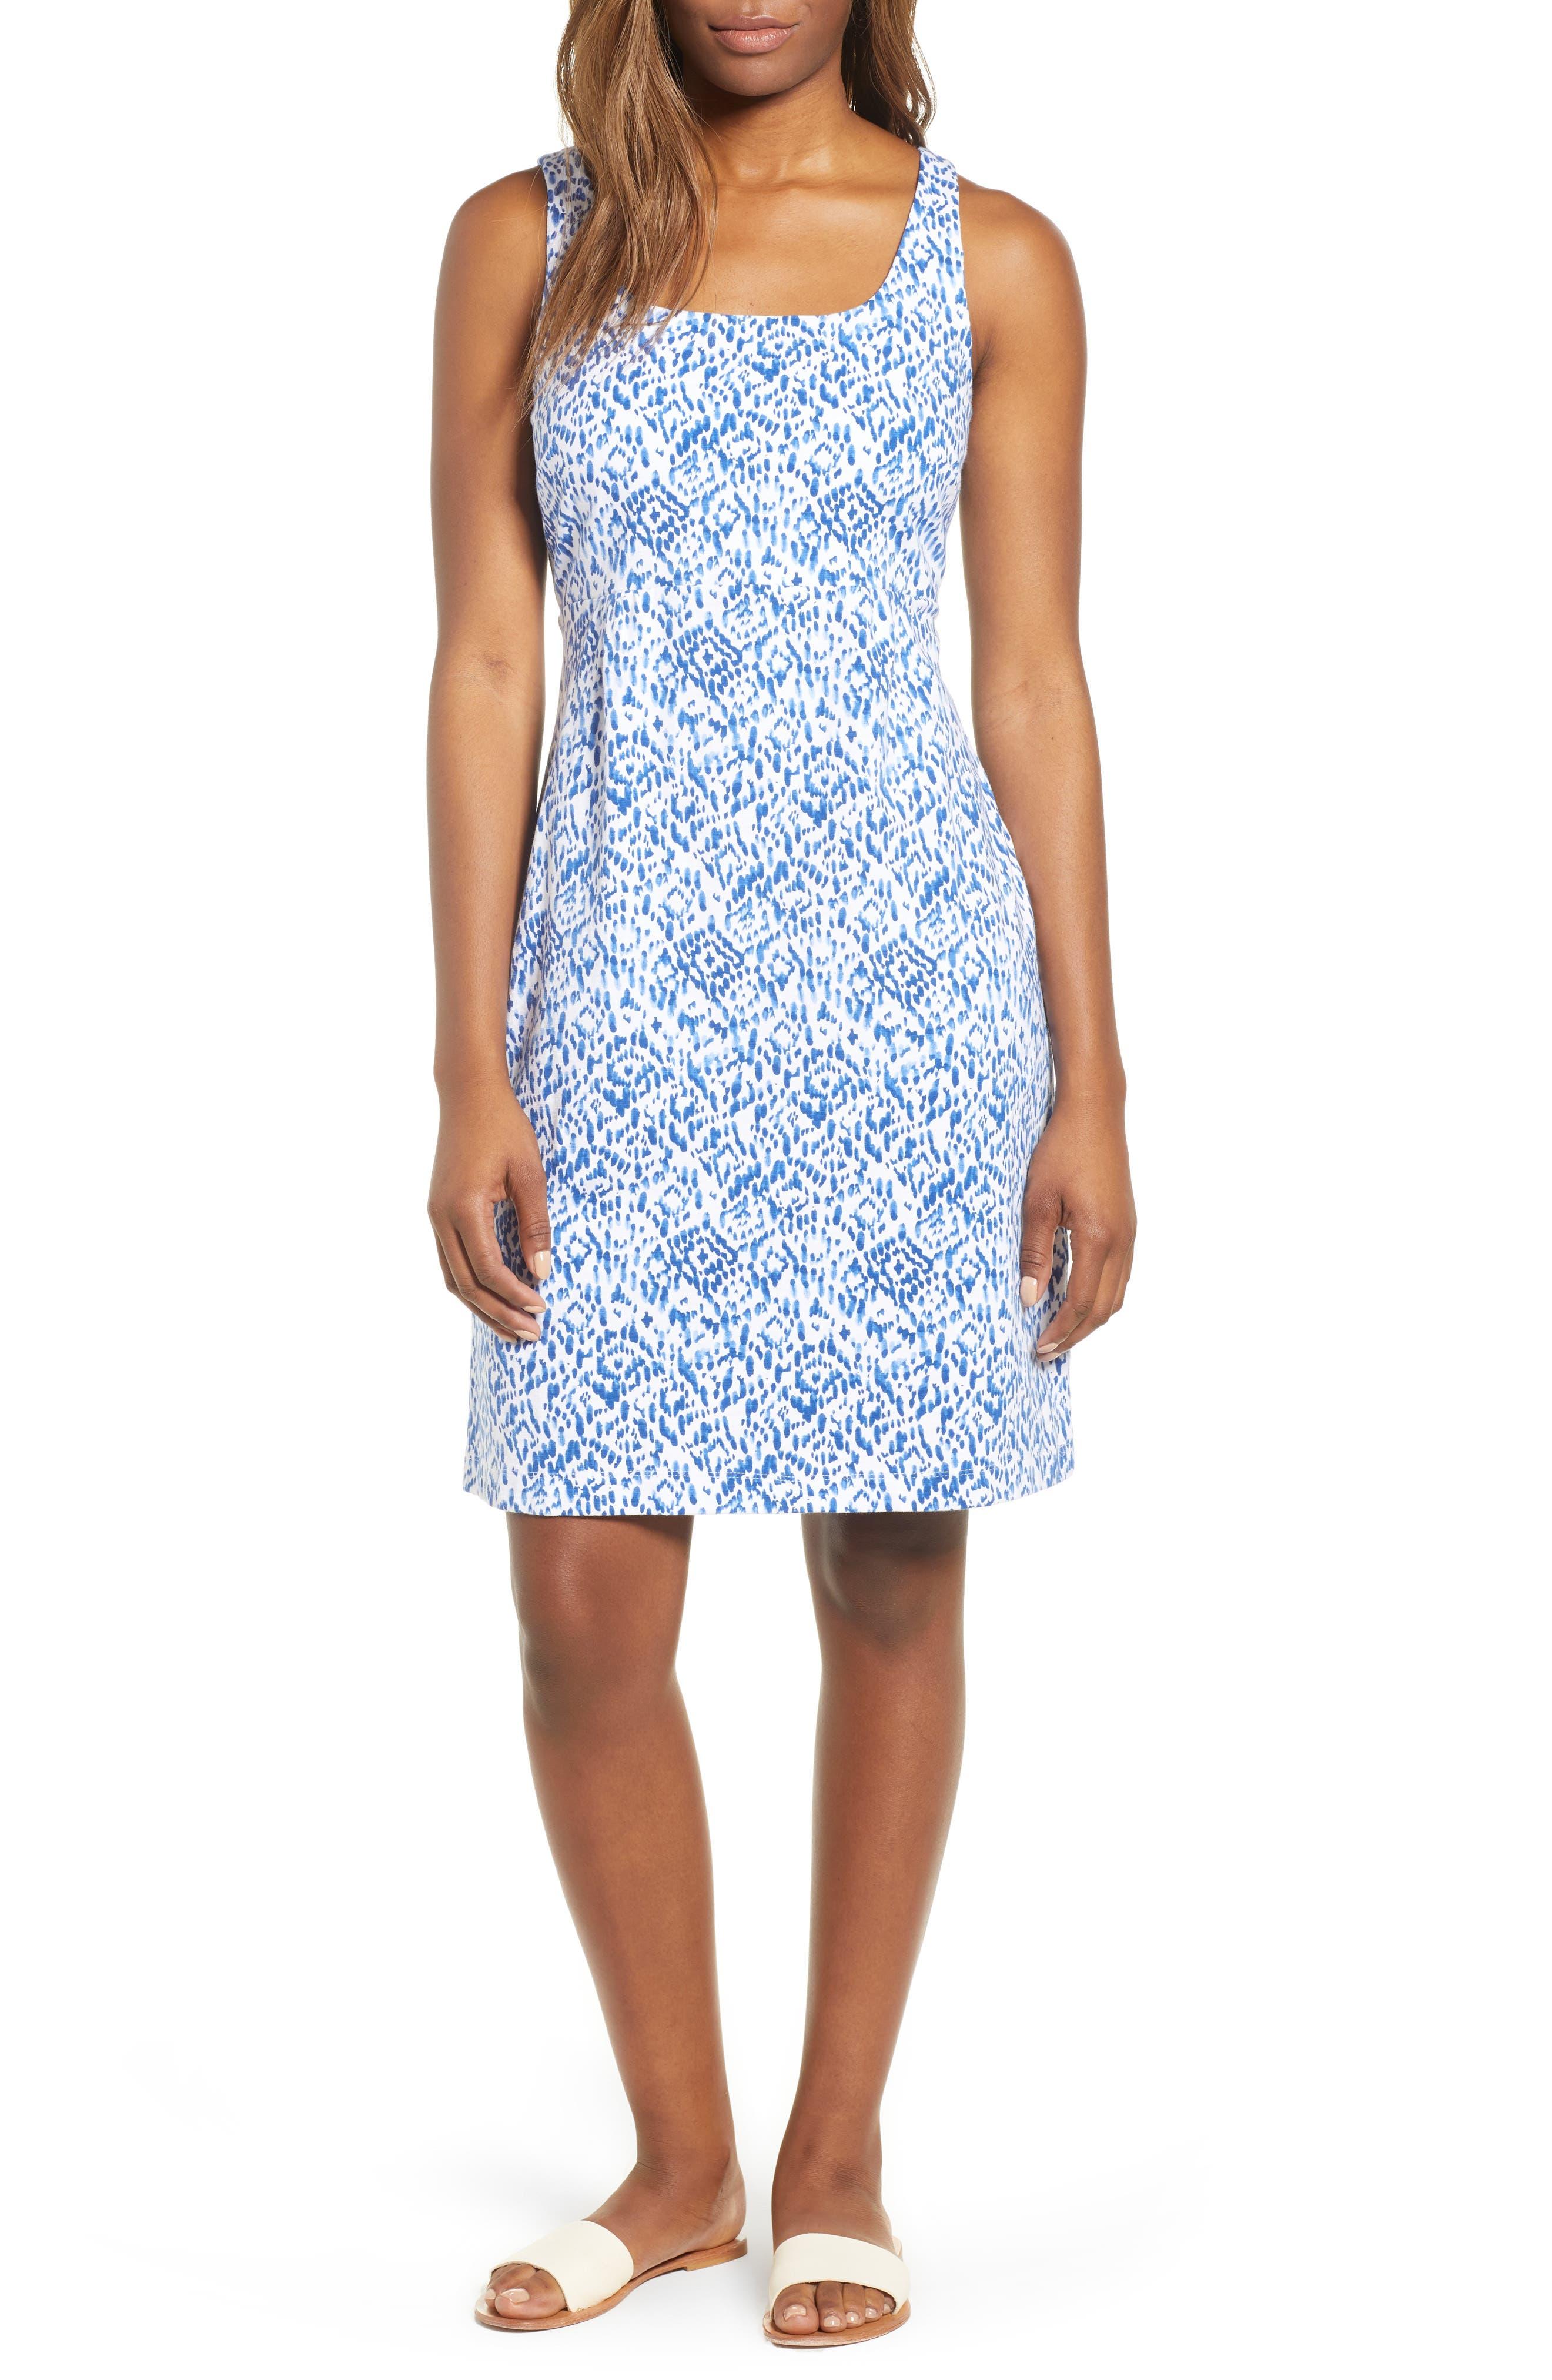 La Liorena Sleeveless Stretch Cotton Tank Dress,                             Main thumbnail 1, color,                             400